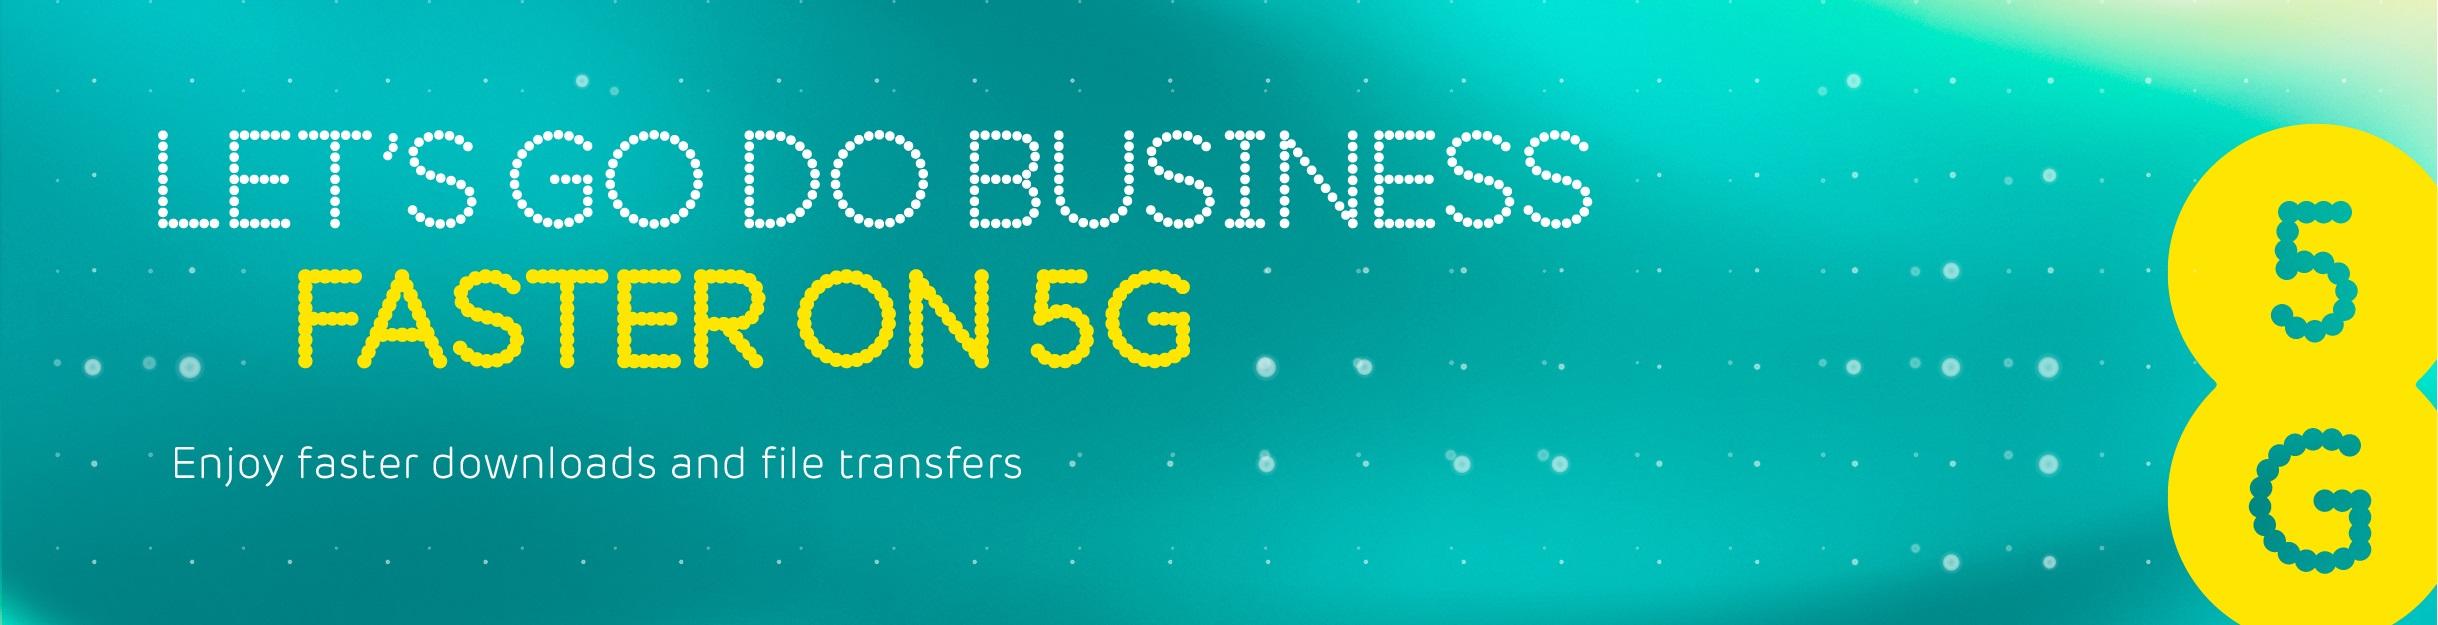 Lets-do-good-business-faster-on-5G-Web-banner